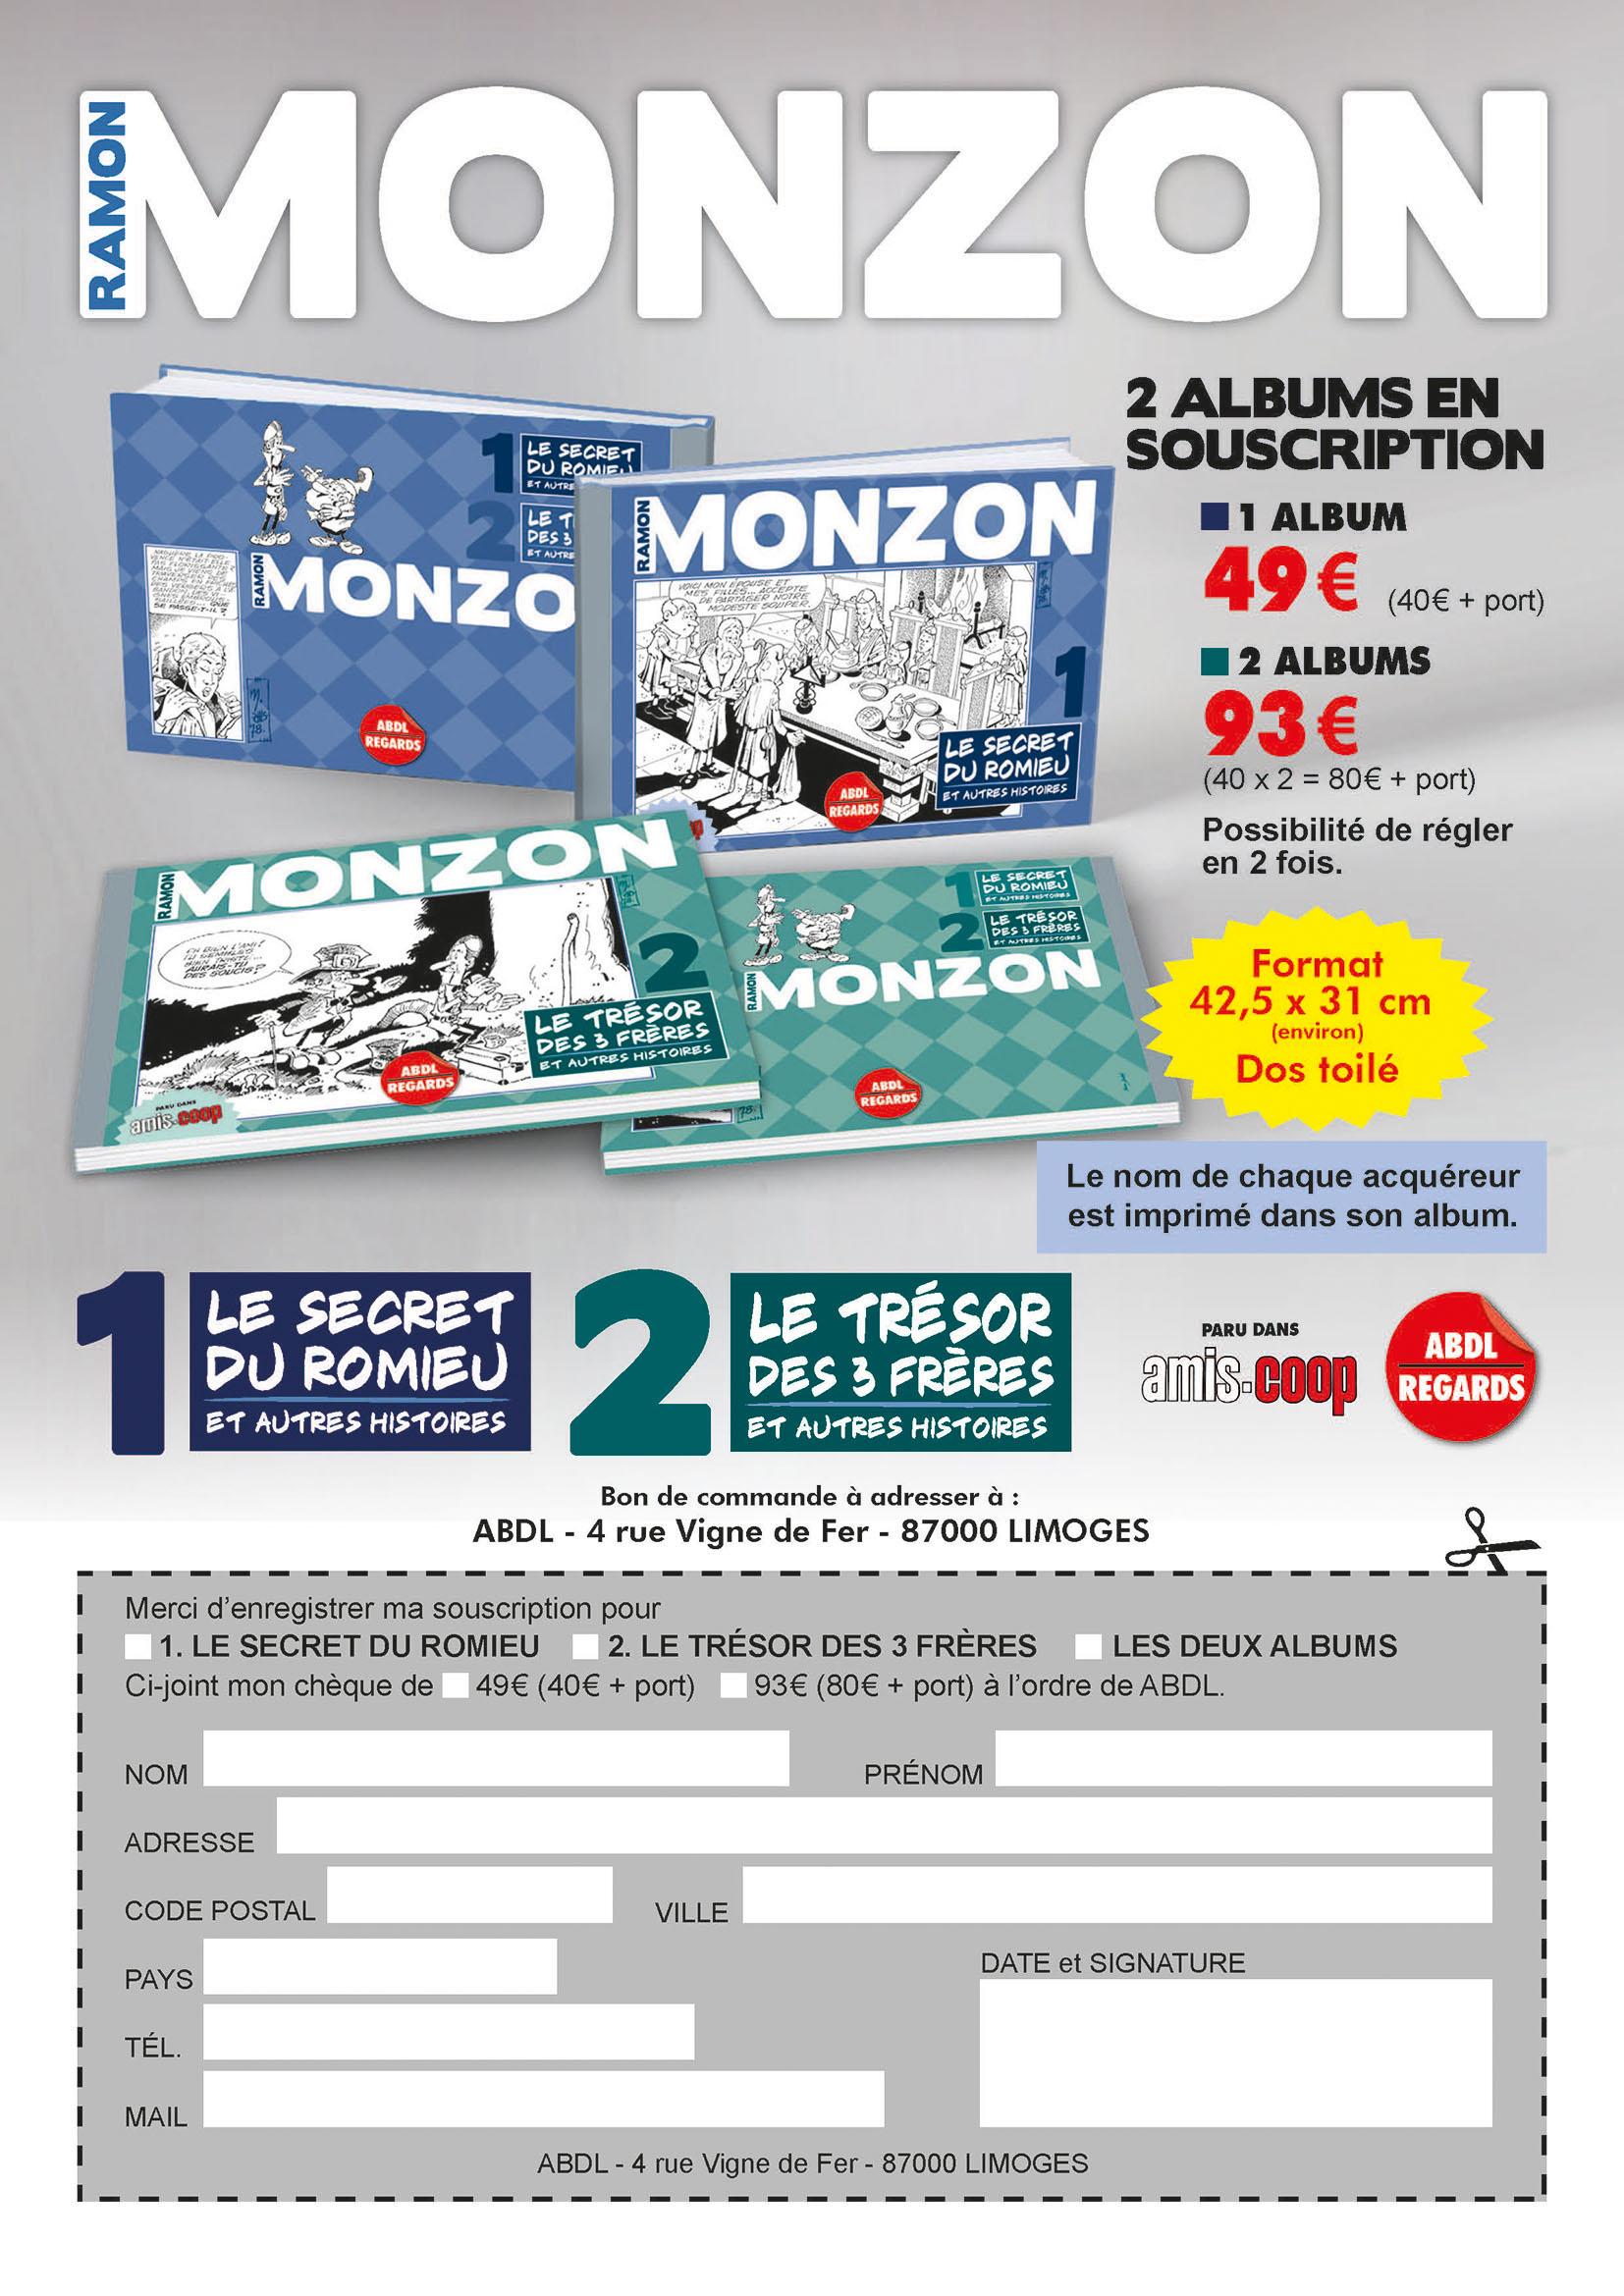 Monzon-Bon de commande 2 albums